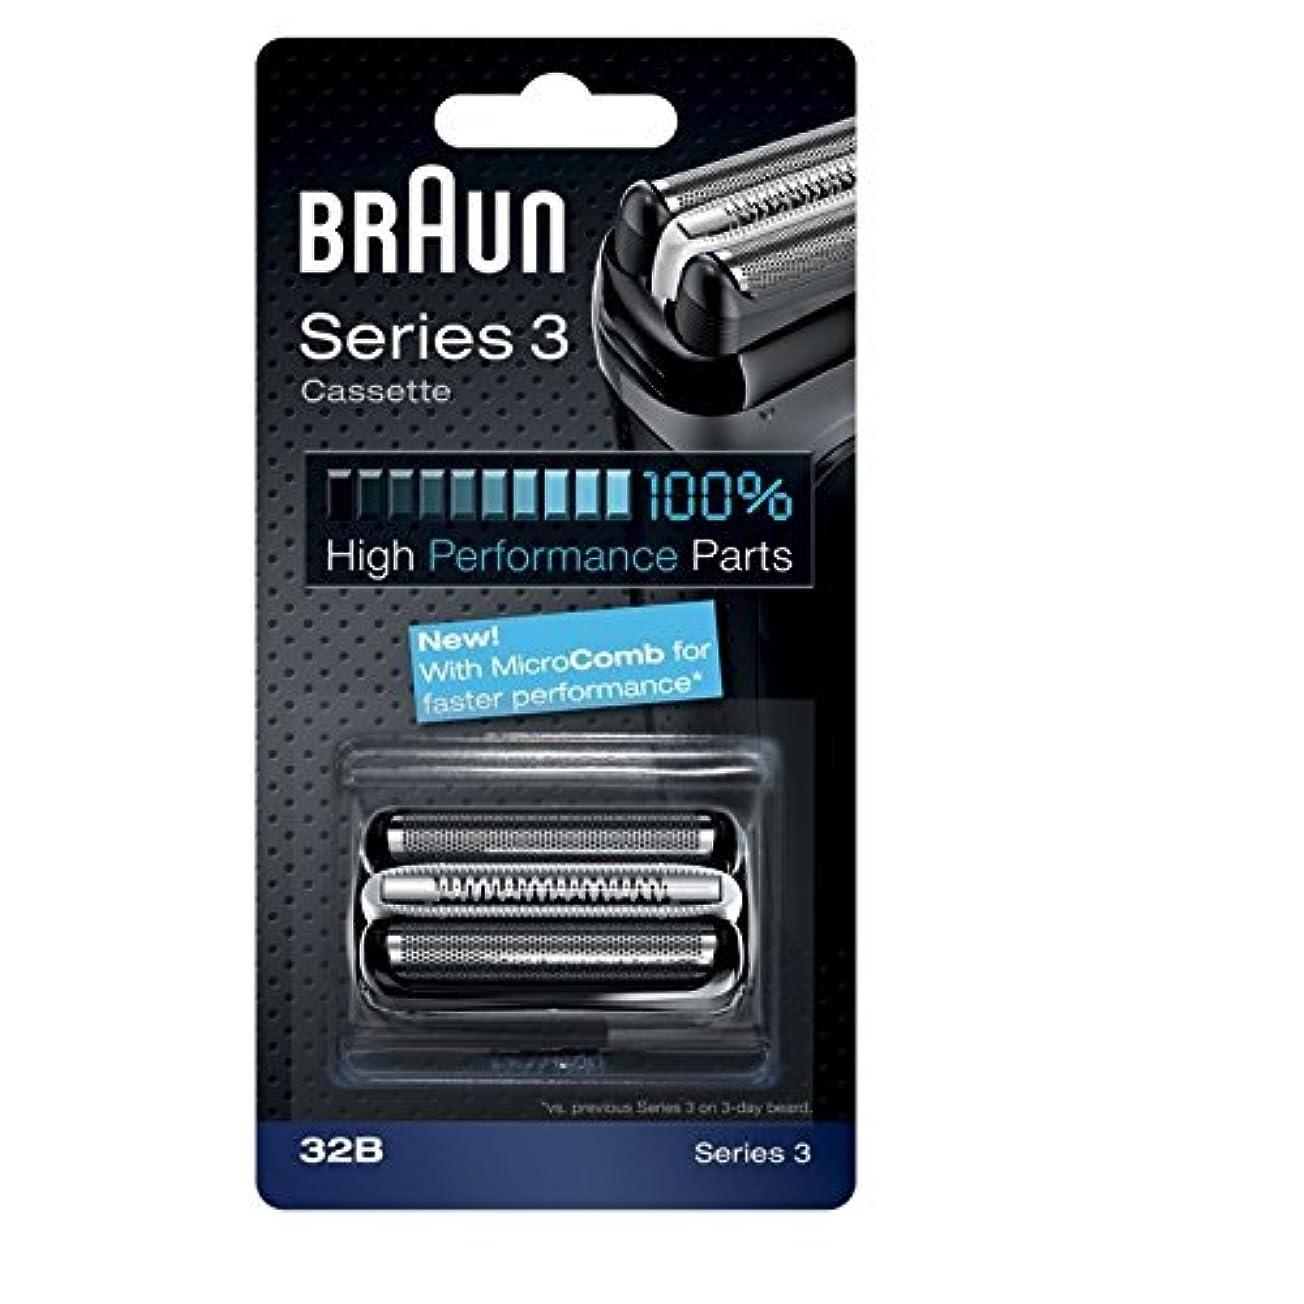 ワーム立場リーBraun razor Replacement Foil & Cutter Cassette 32B Series 3 320 330 340 350CC black shaving heads [並行輸入品]